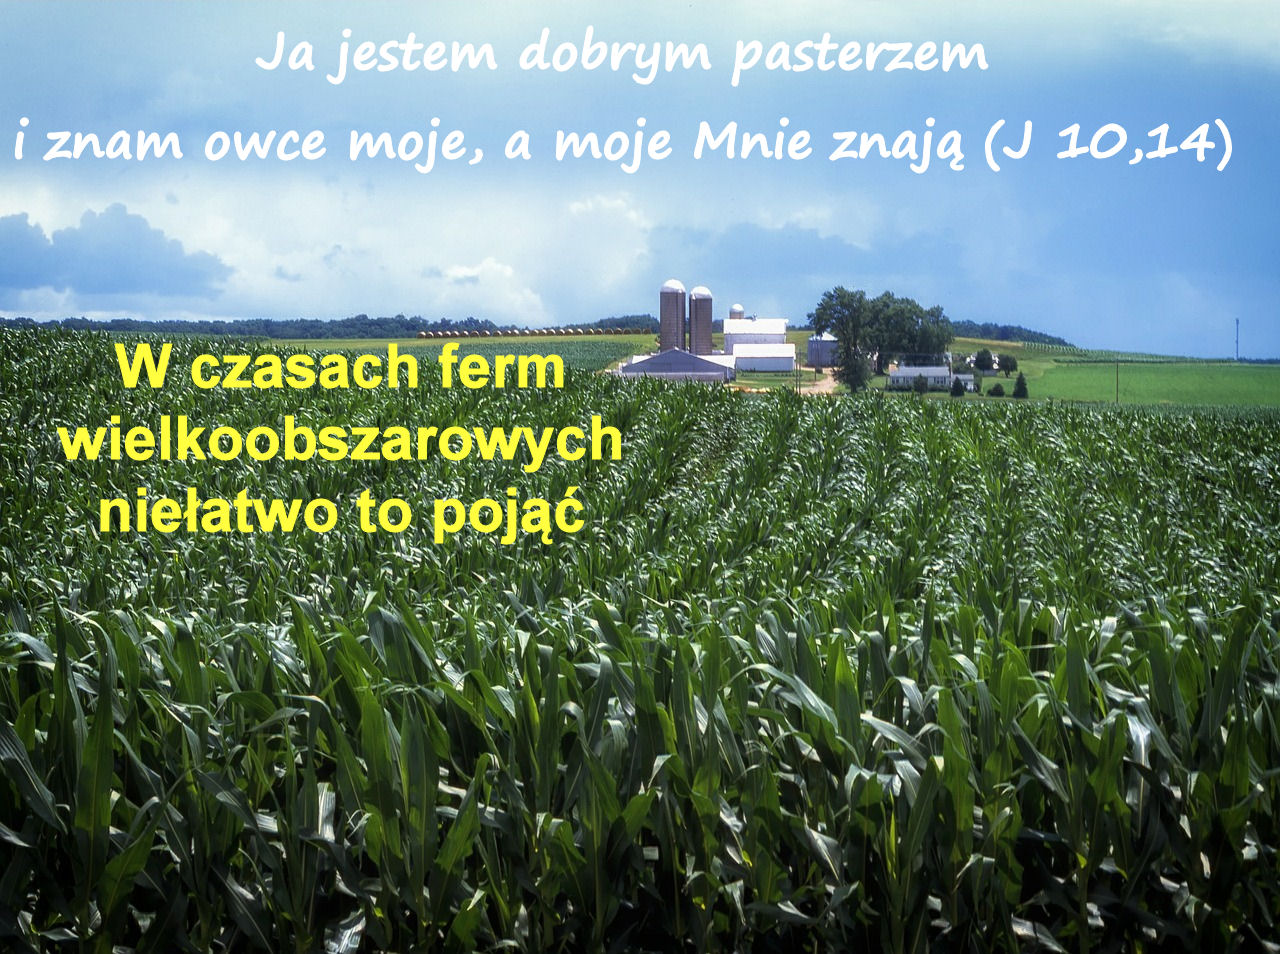 dobry_pasterz